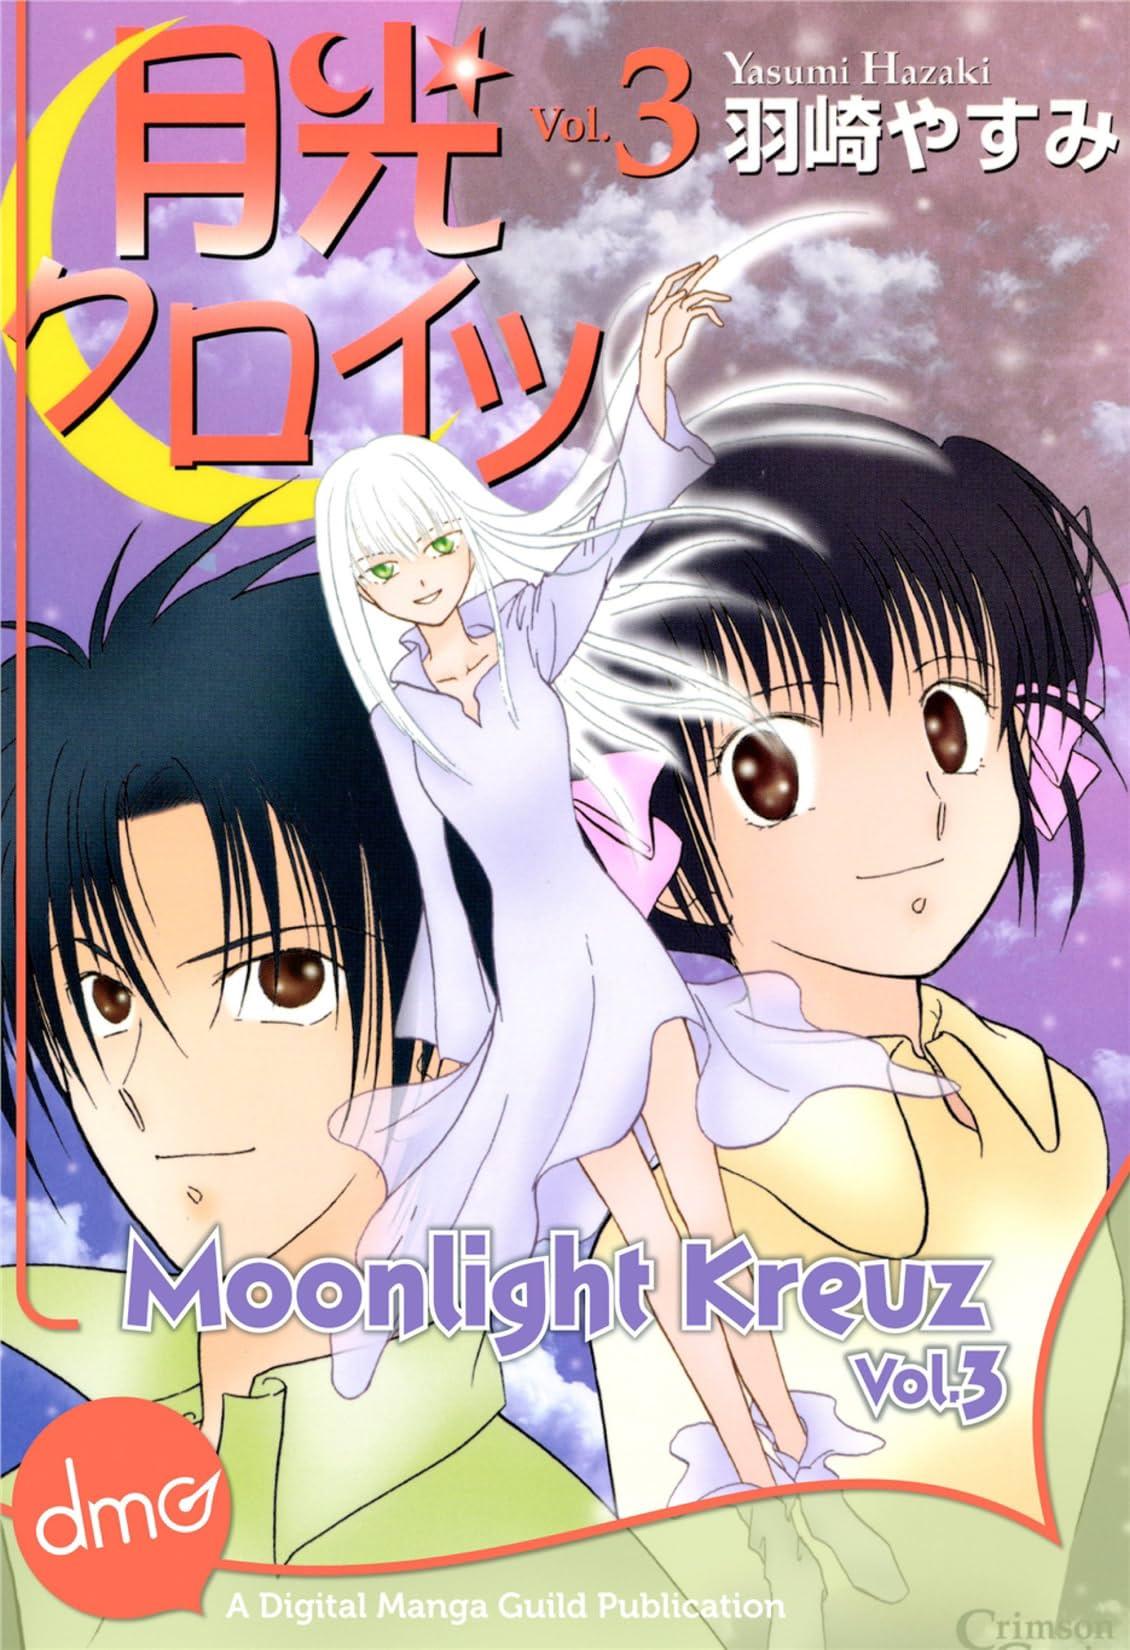 Moonlight Kreuz Vol. 3